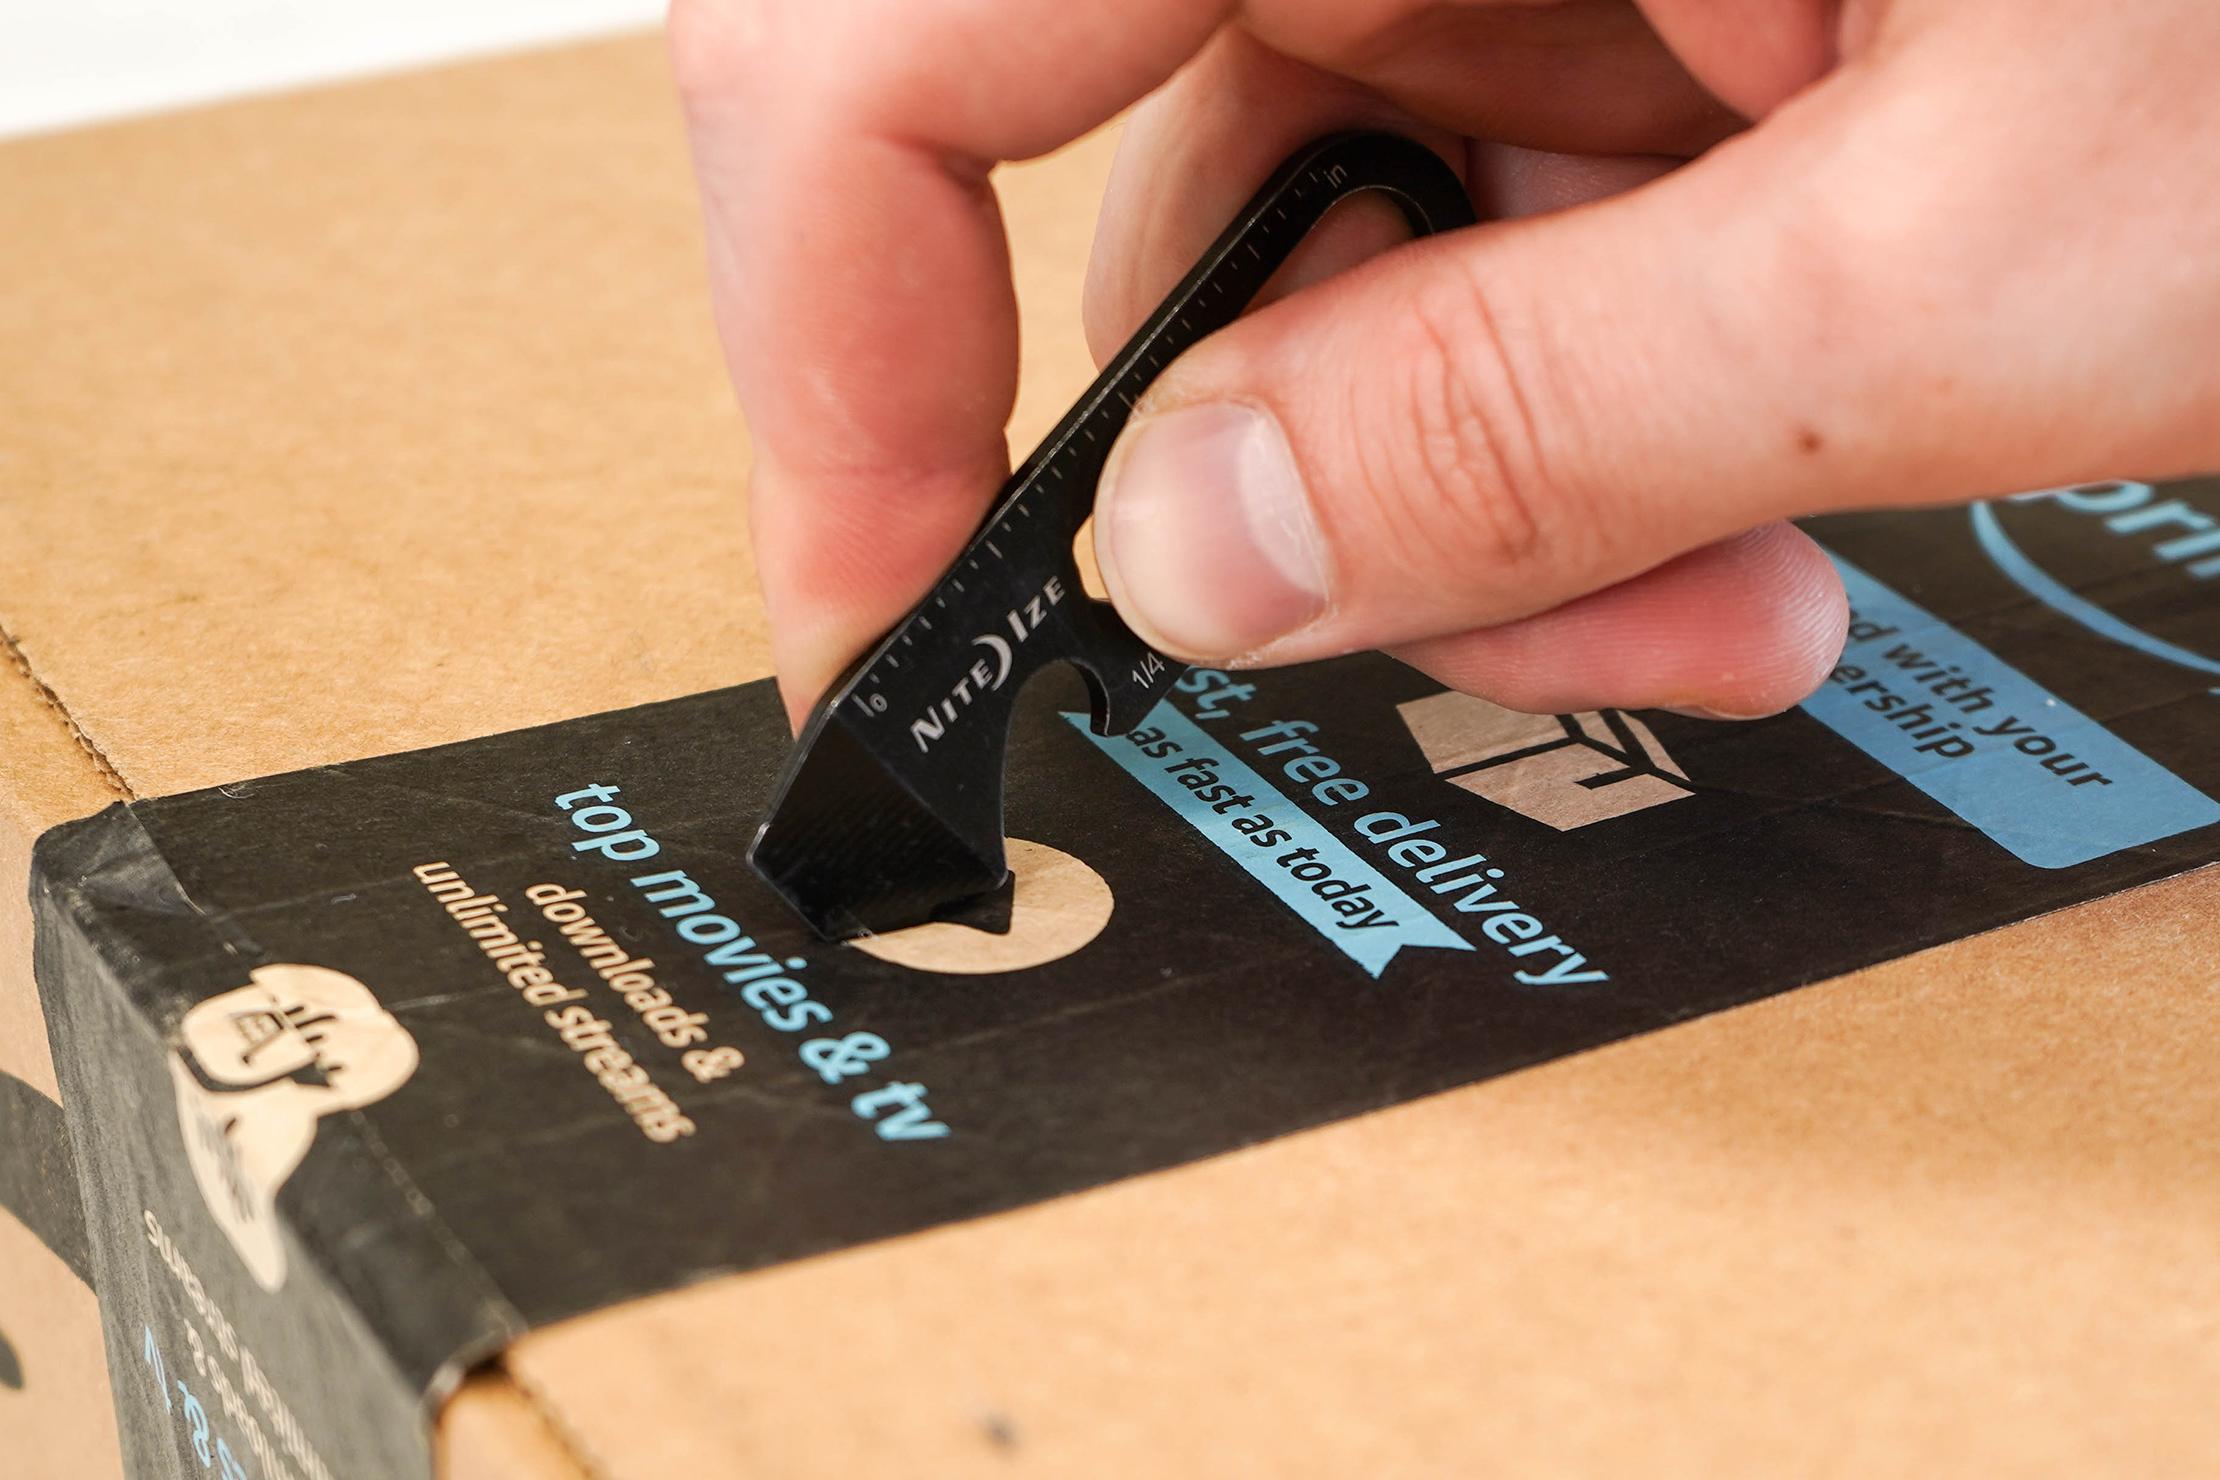 Nite Ize Doohickey Cutting Box